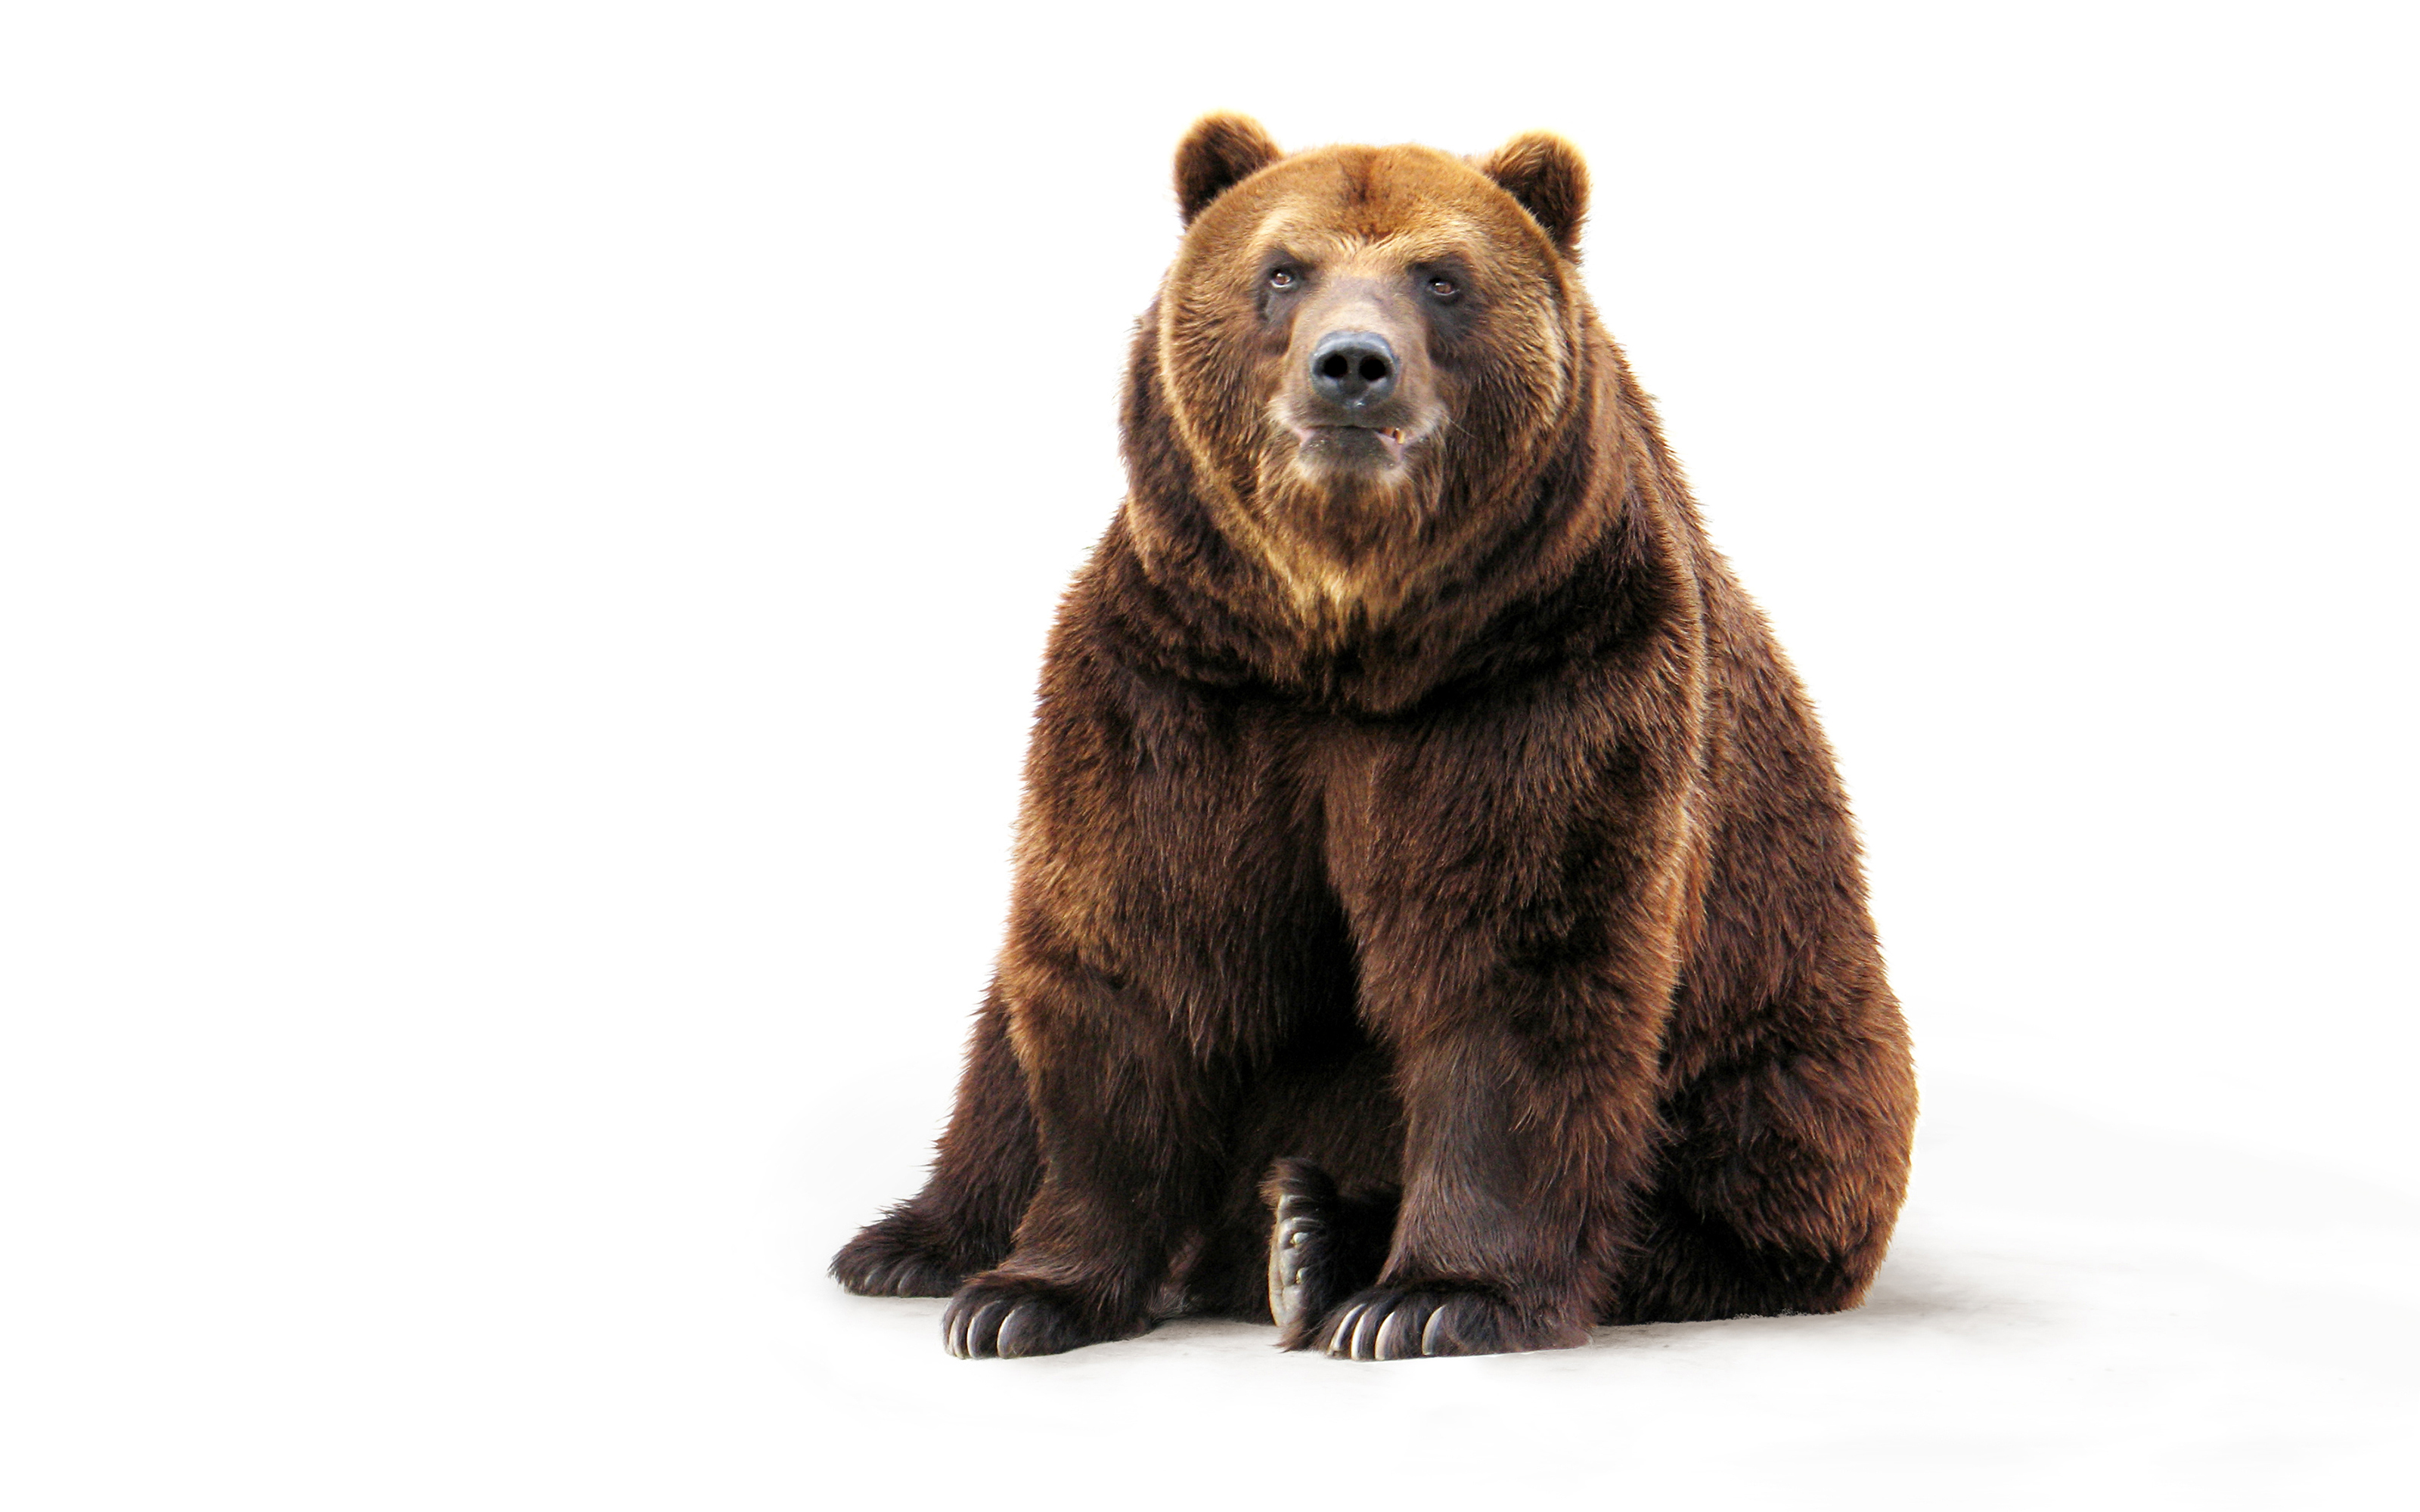 грей картинки для медведь на прозрачном фоне картинки которую